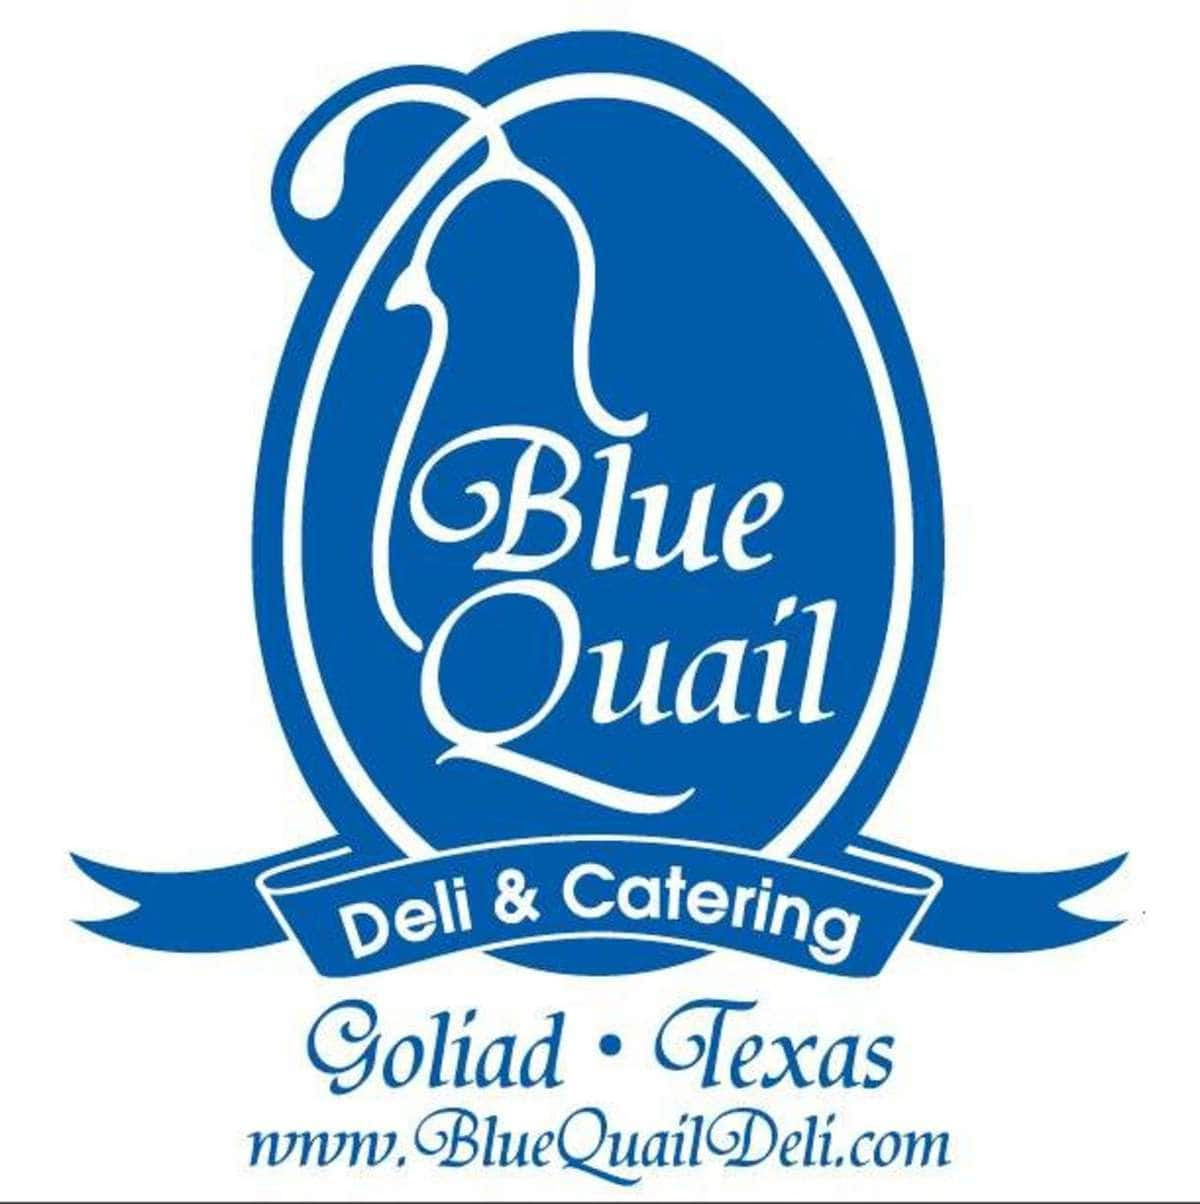 Blue Quail Deli